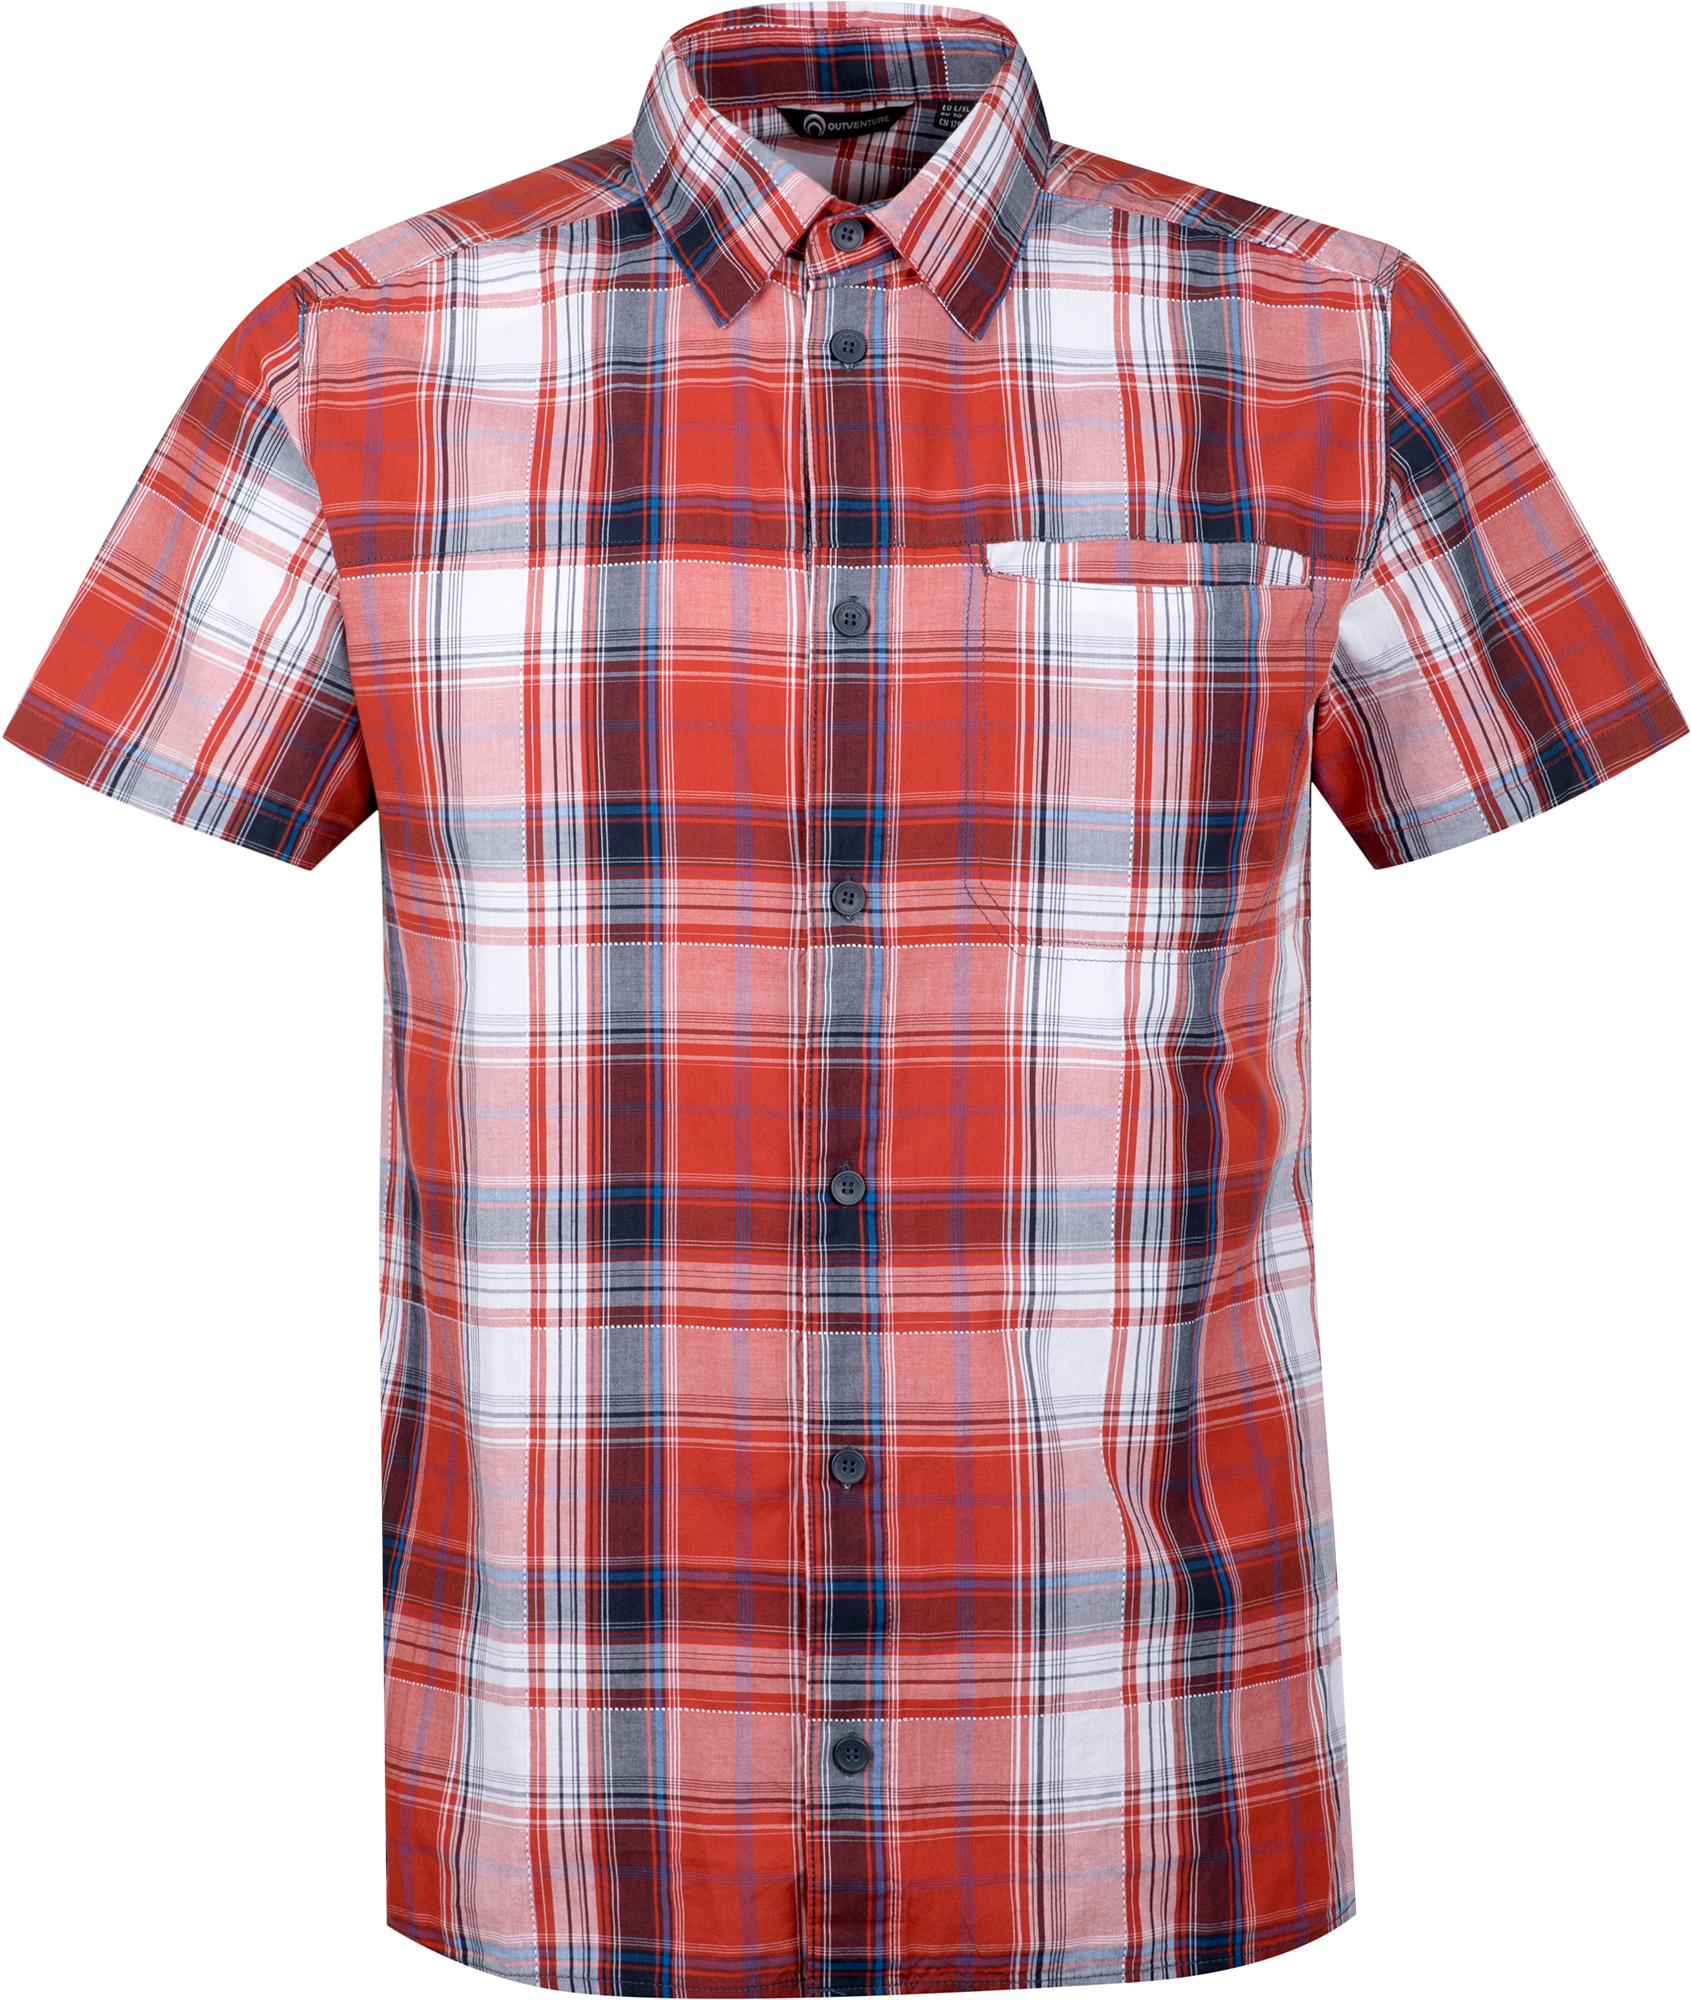 цена на Outventure Рубашка с коротким рукавом мужская Outventure, размер 52